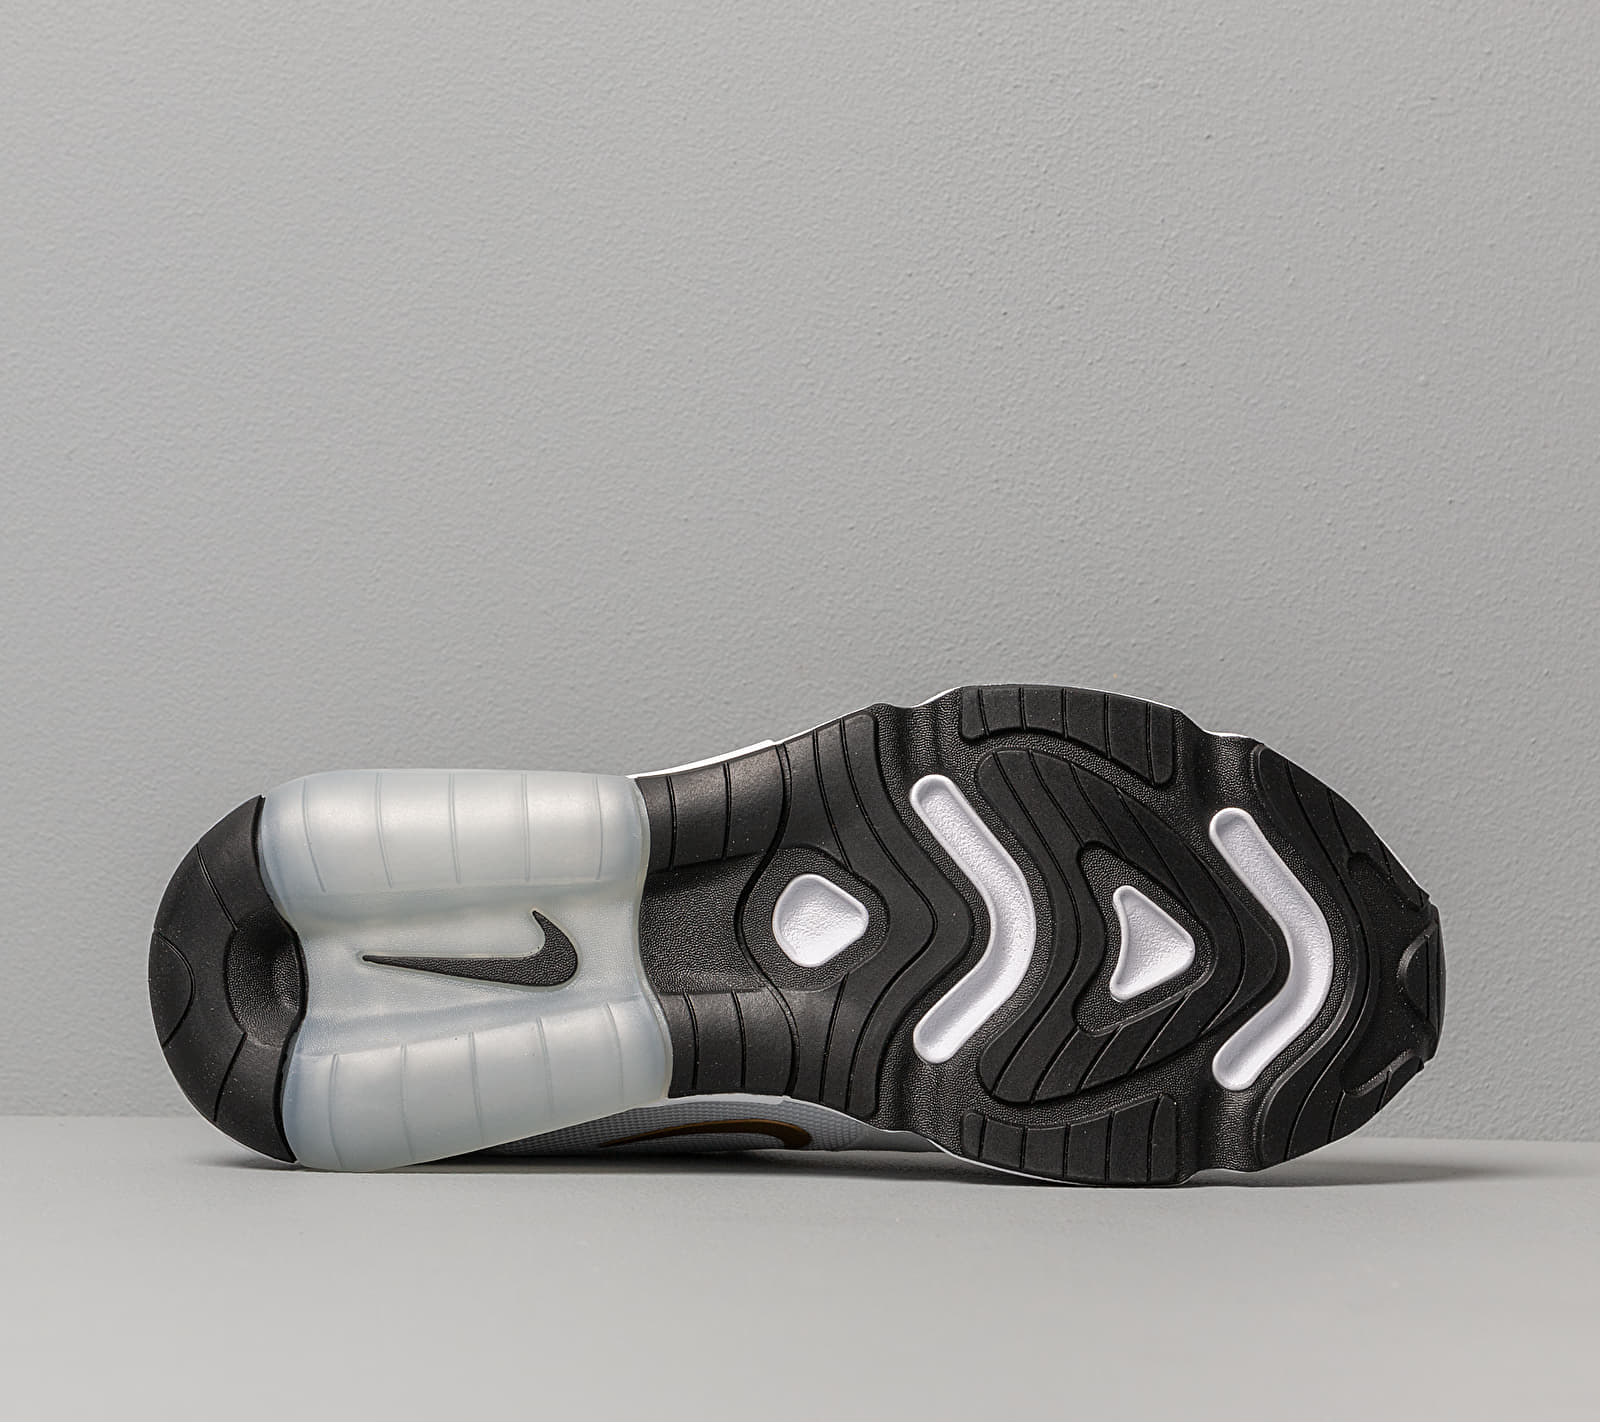 Nike W Air Max 200 White Metallic Gold Black footshop.eu